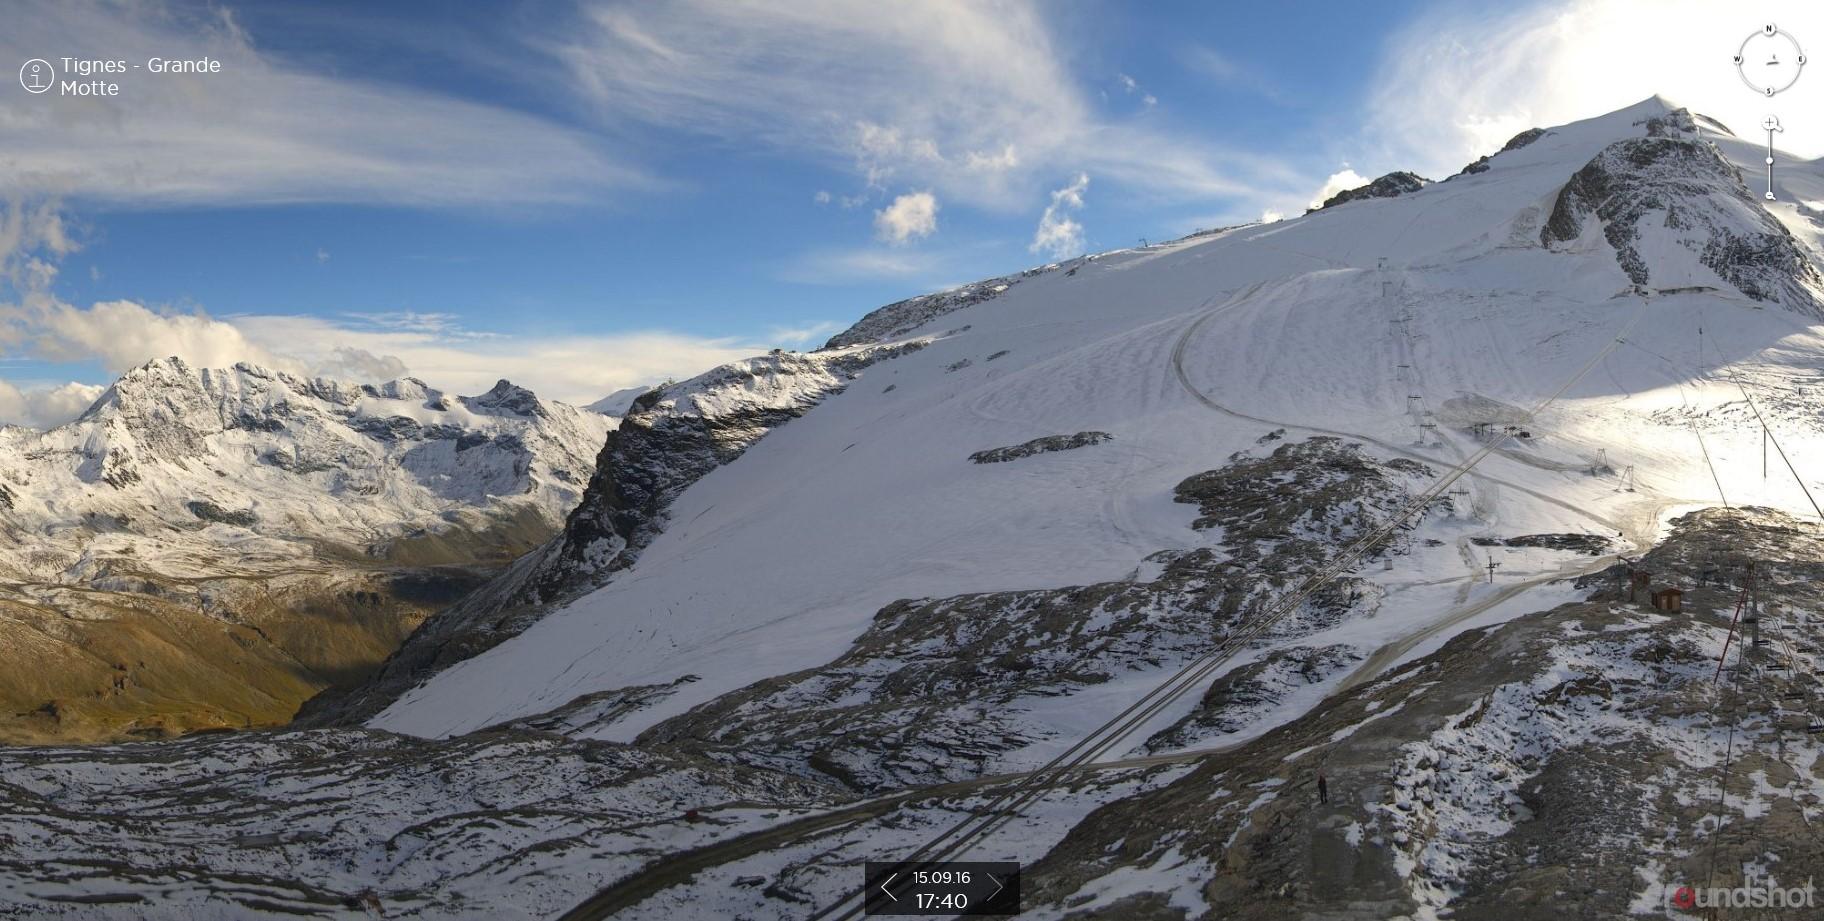 Nowcasting nivo-glaciali Alpi autunno 2016-grande-motte-15.09.16.jpg